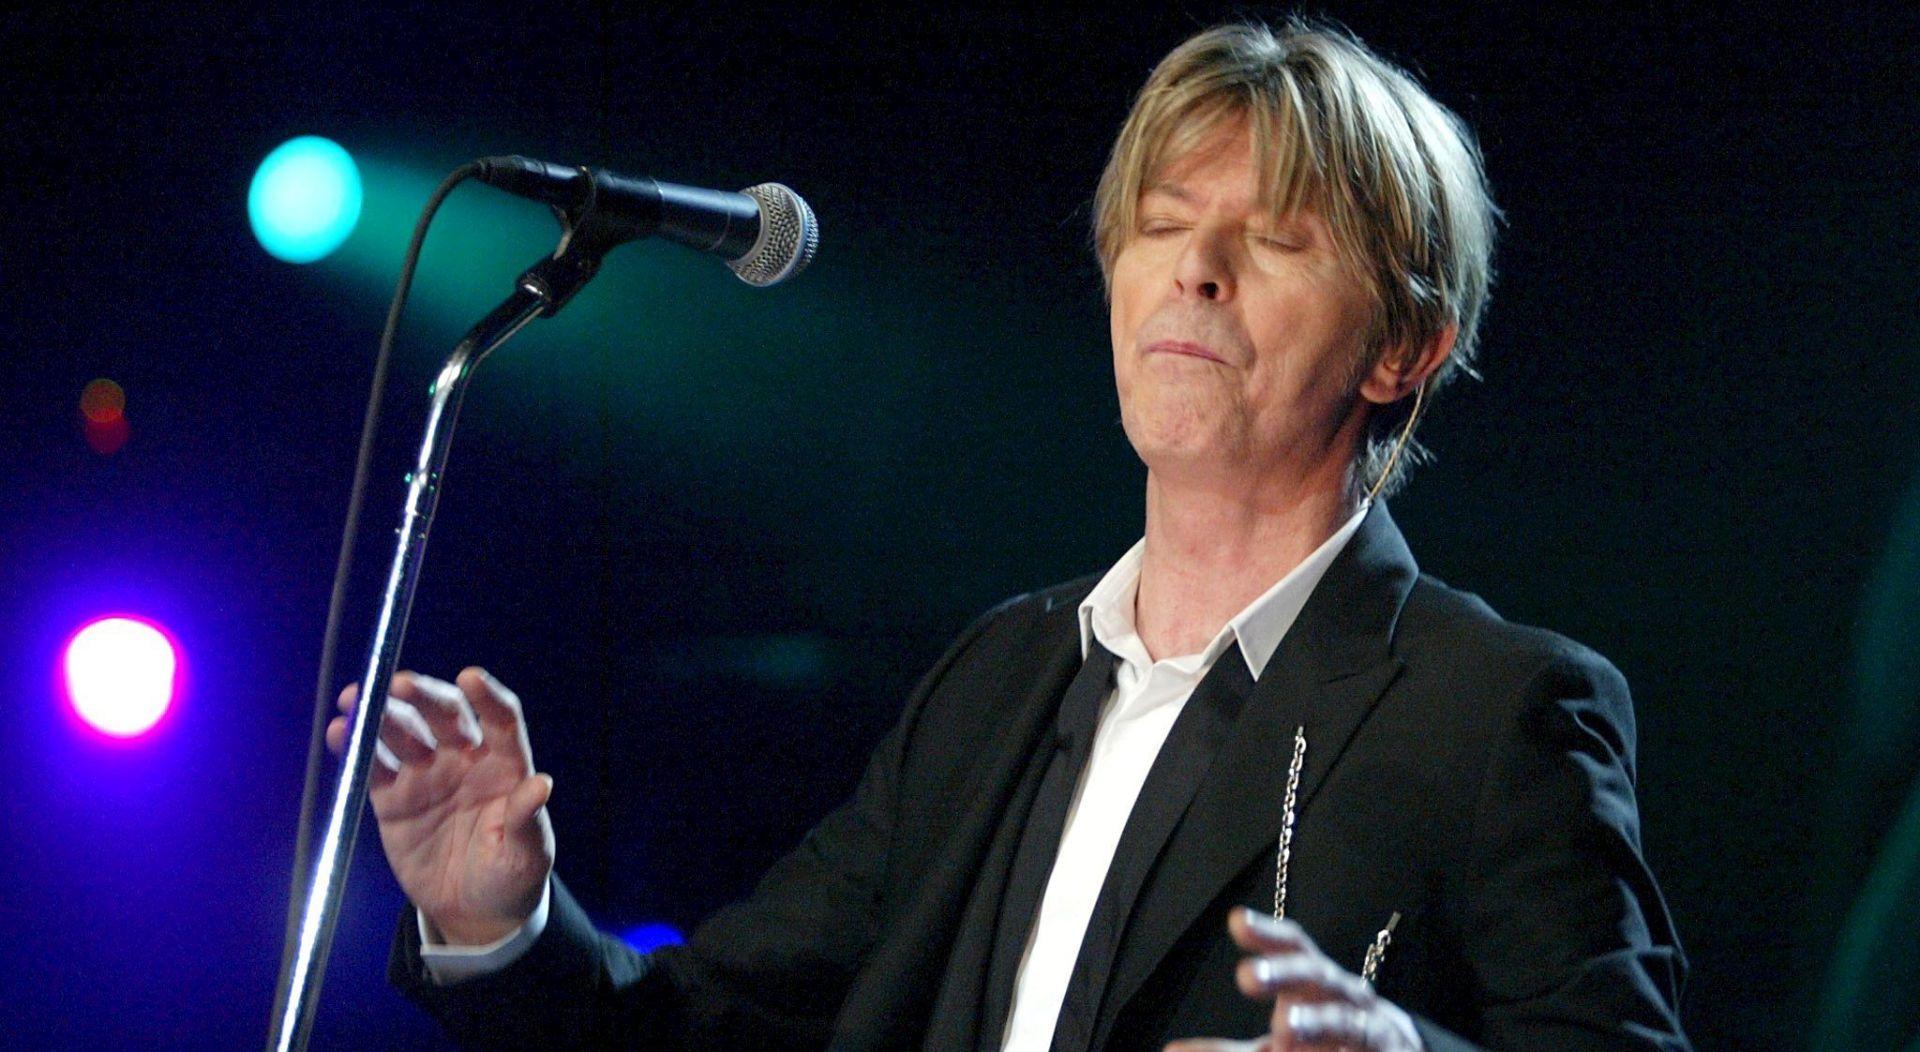 VIDEO: FANTASTIČAN GLAZBENIK, ALI I GLUMAC Prisjetimo se najboljih uloga Davida Bowiea